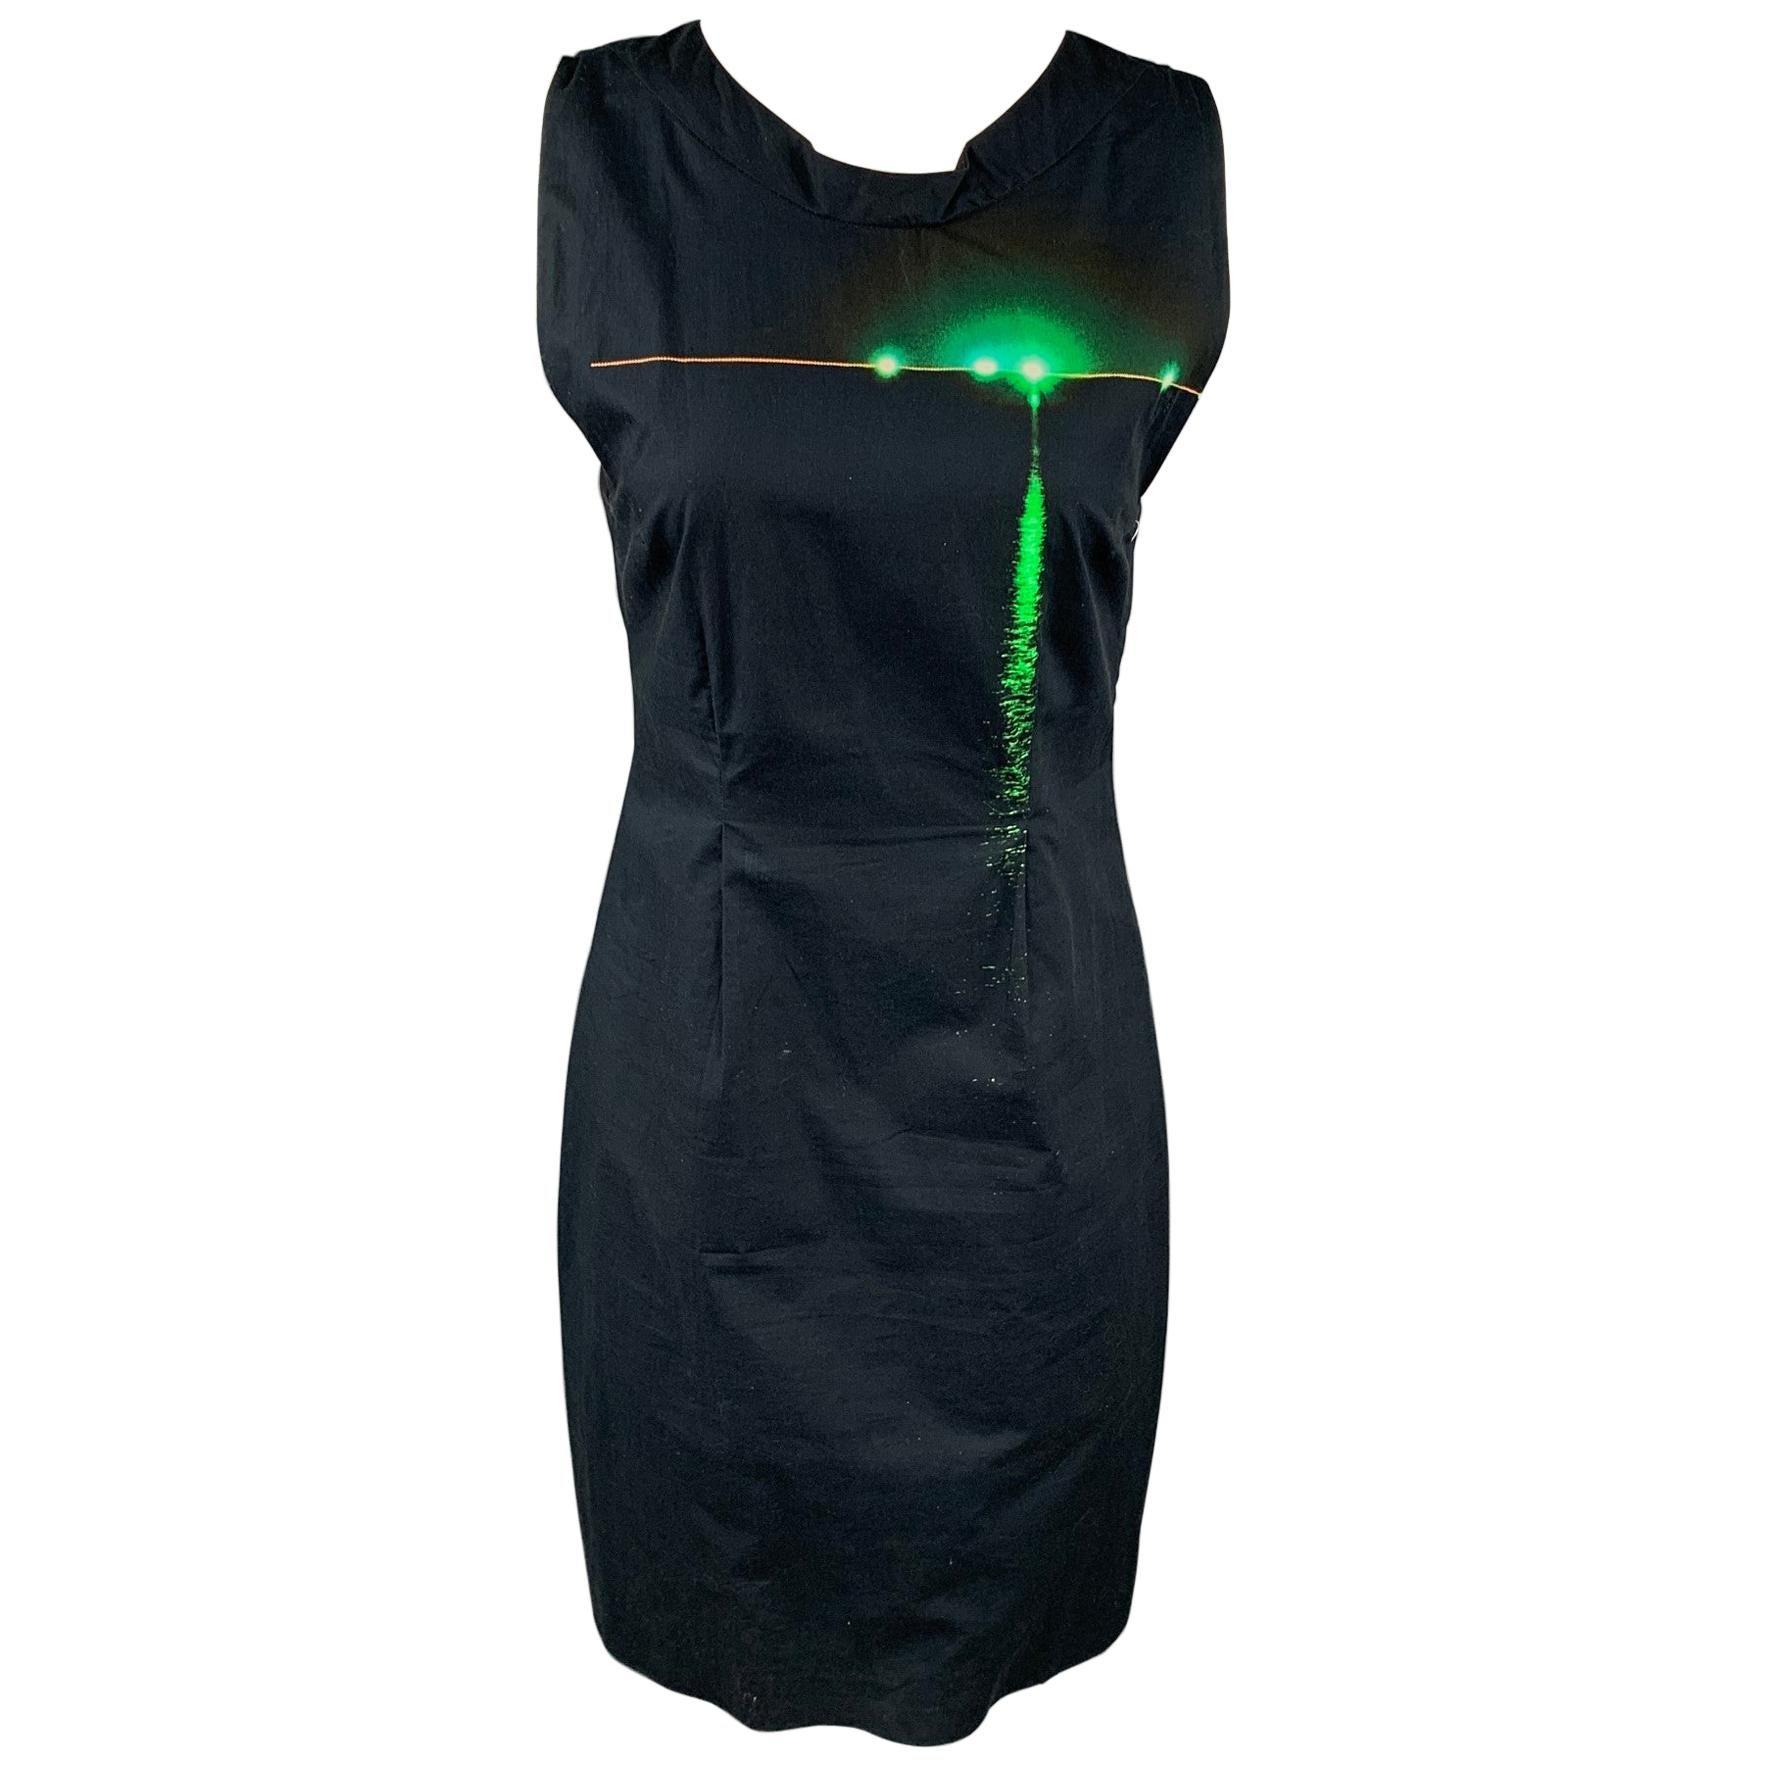 DRIES VAN NOTEN Size 6 Black & Green Poplin Cotton Shift Dress